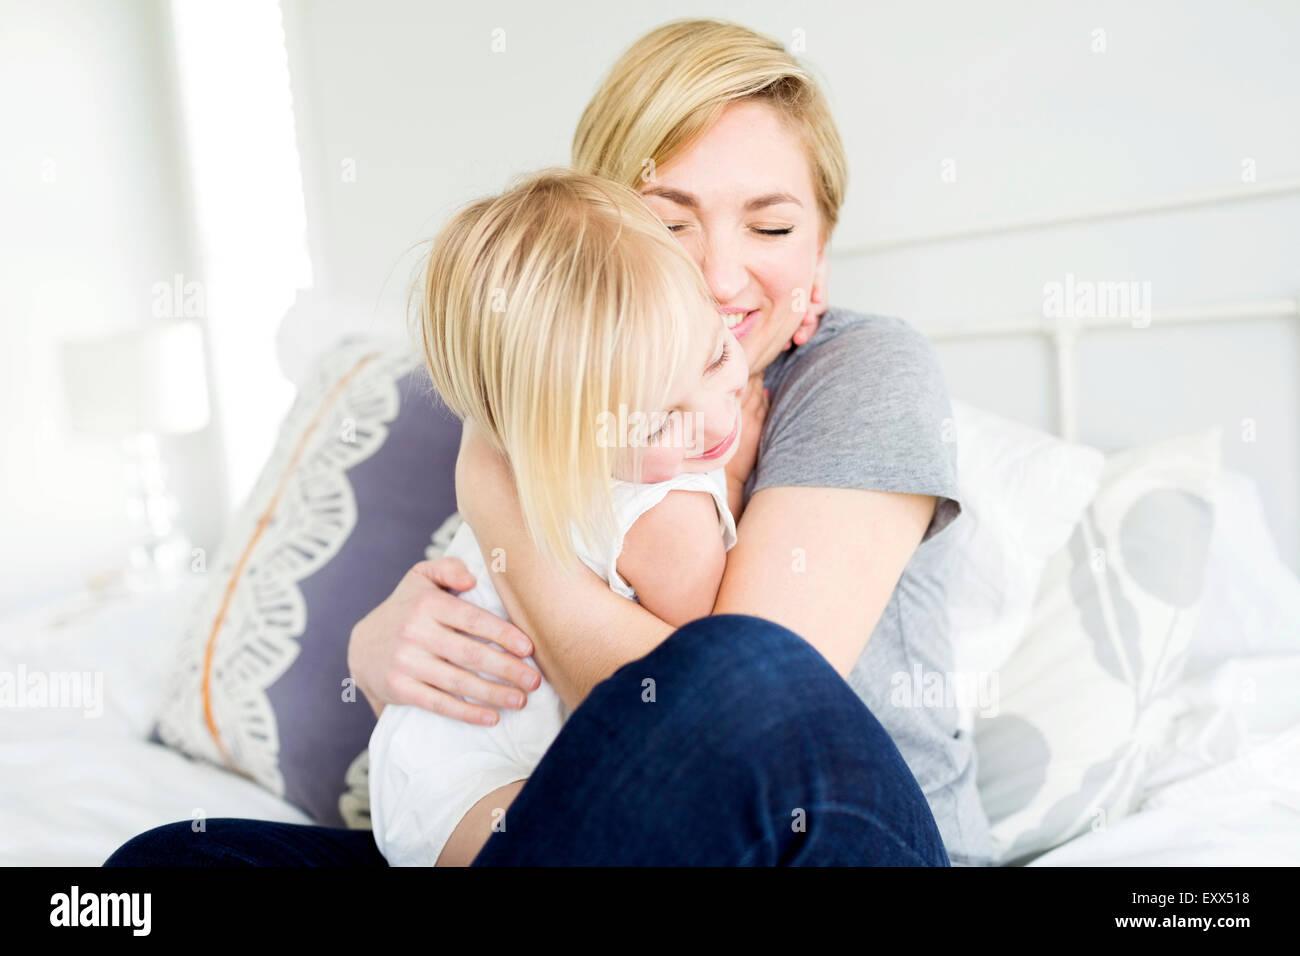 Frau umarmt Tochter im Schlafzimmer (2-3) Stockbild